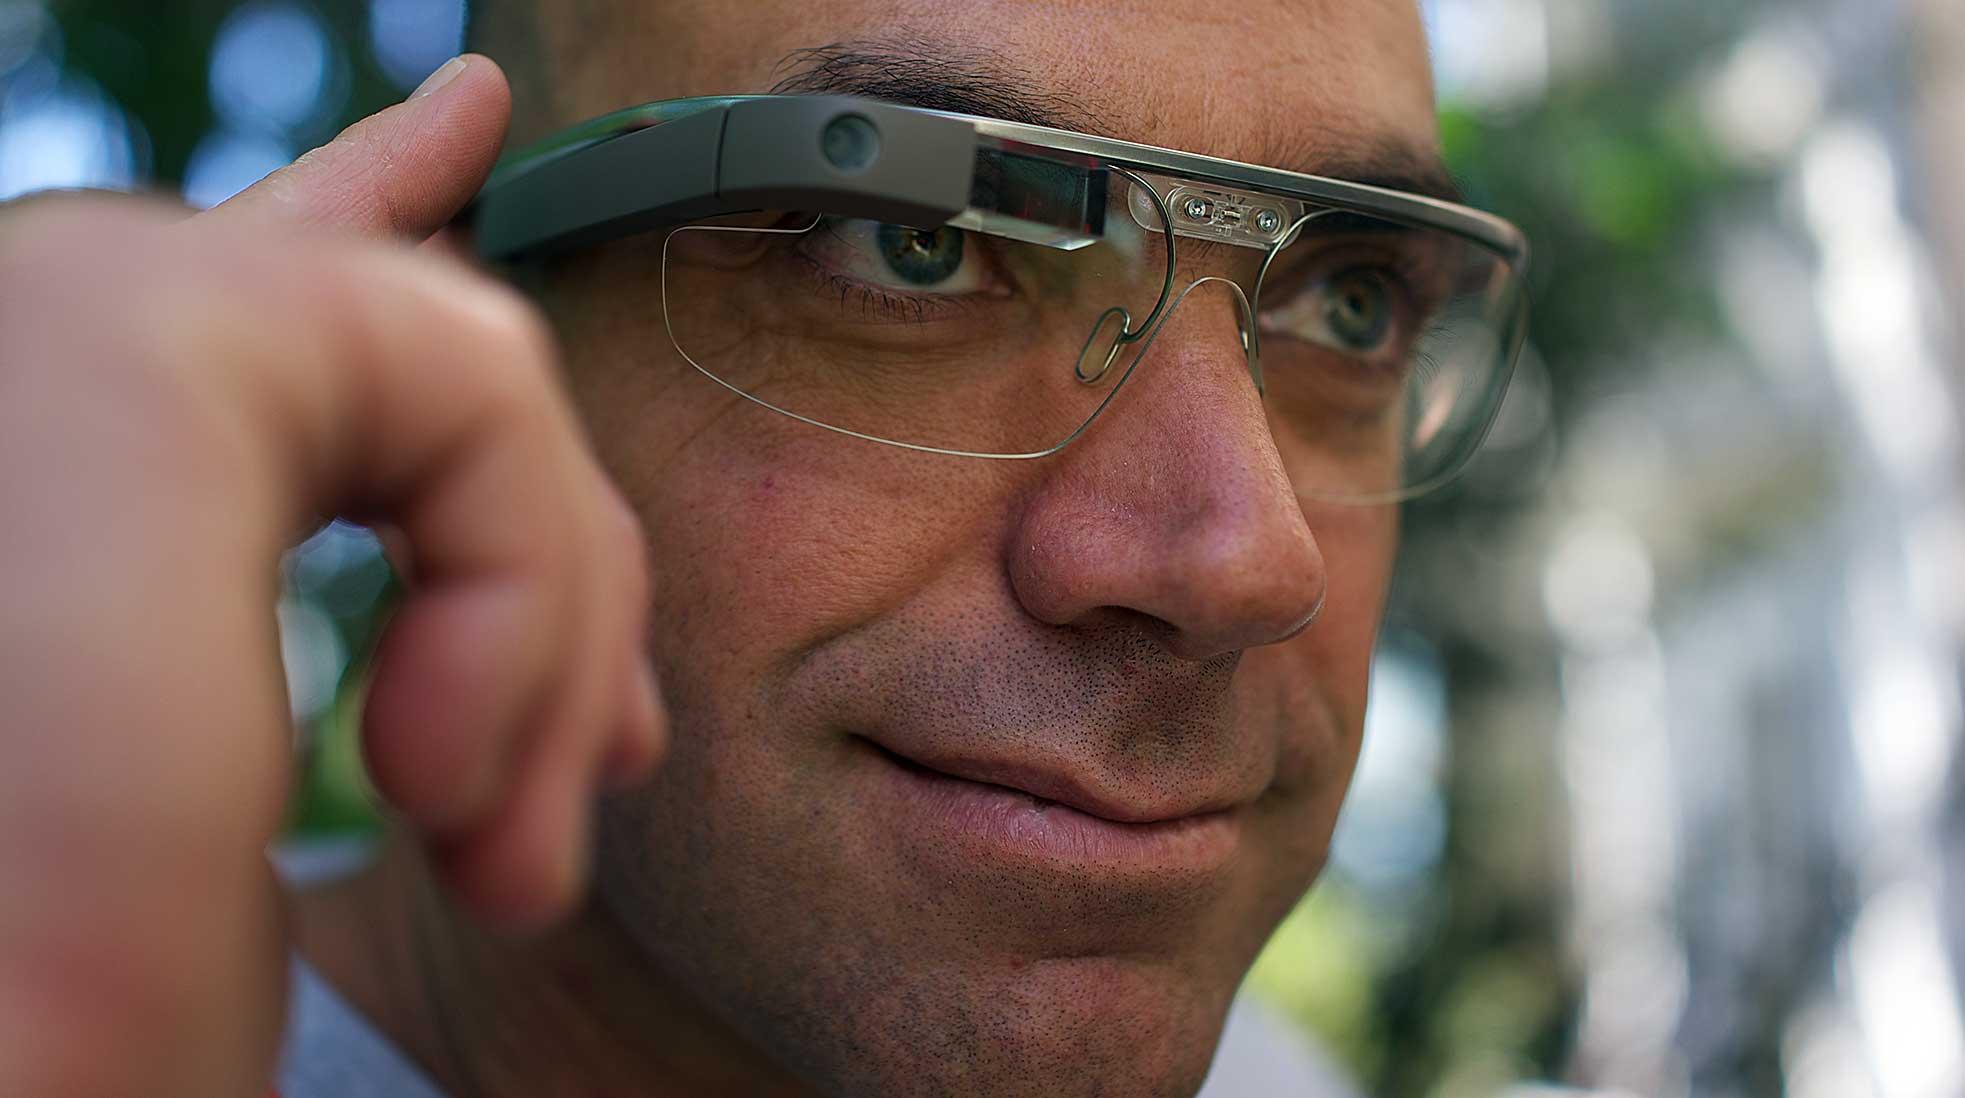 En man som bär Google Glass. Foto: Loïc Le Meur via Wikimedia Commons (CC BY 2.0).